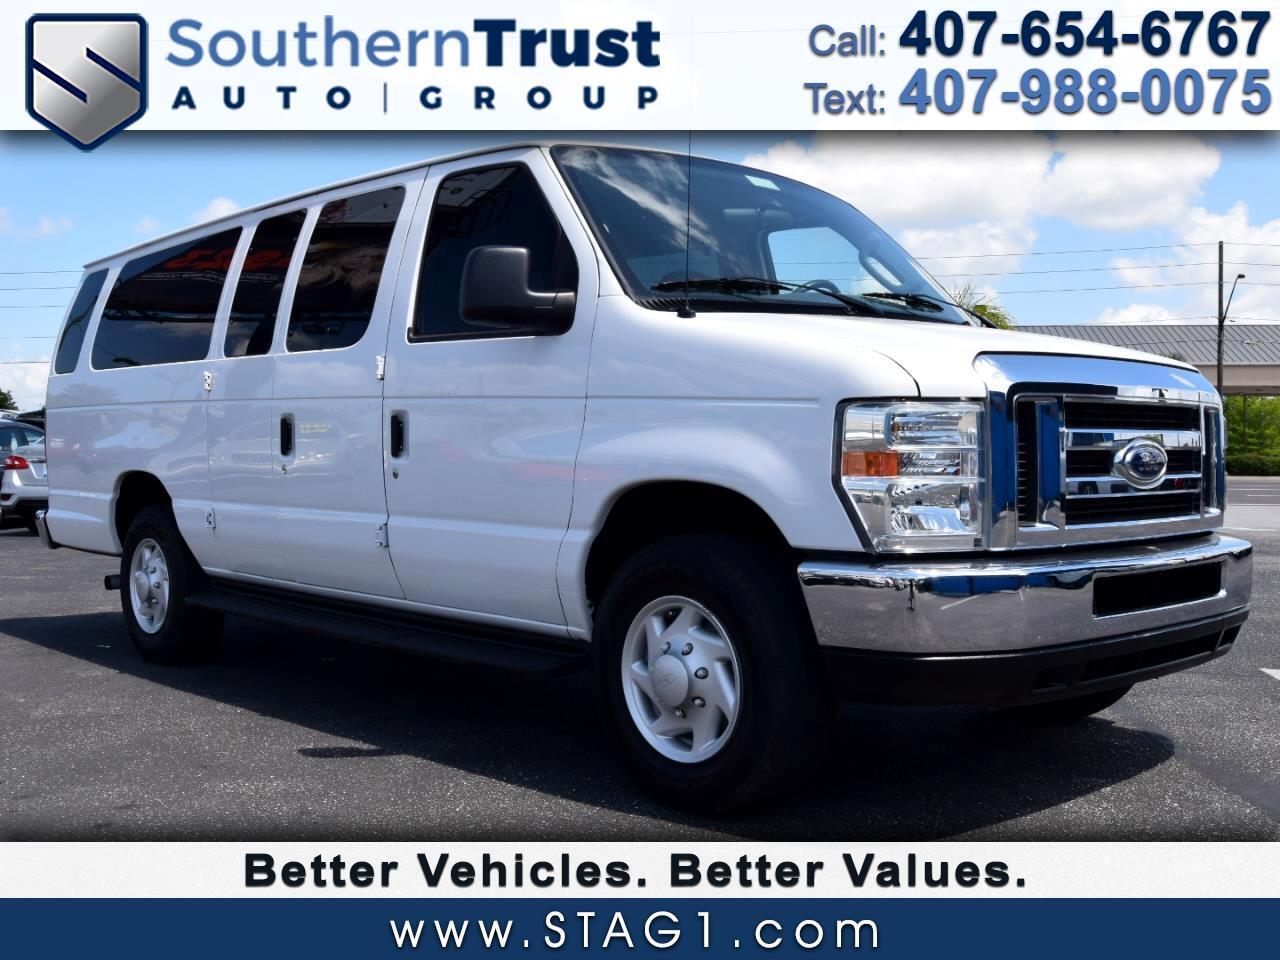 2008 Ford Econoline Wagon E-350 Super Duty Ext XLT